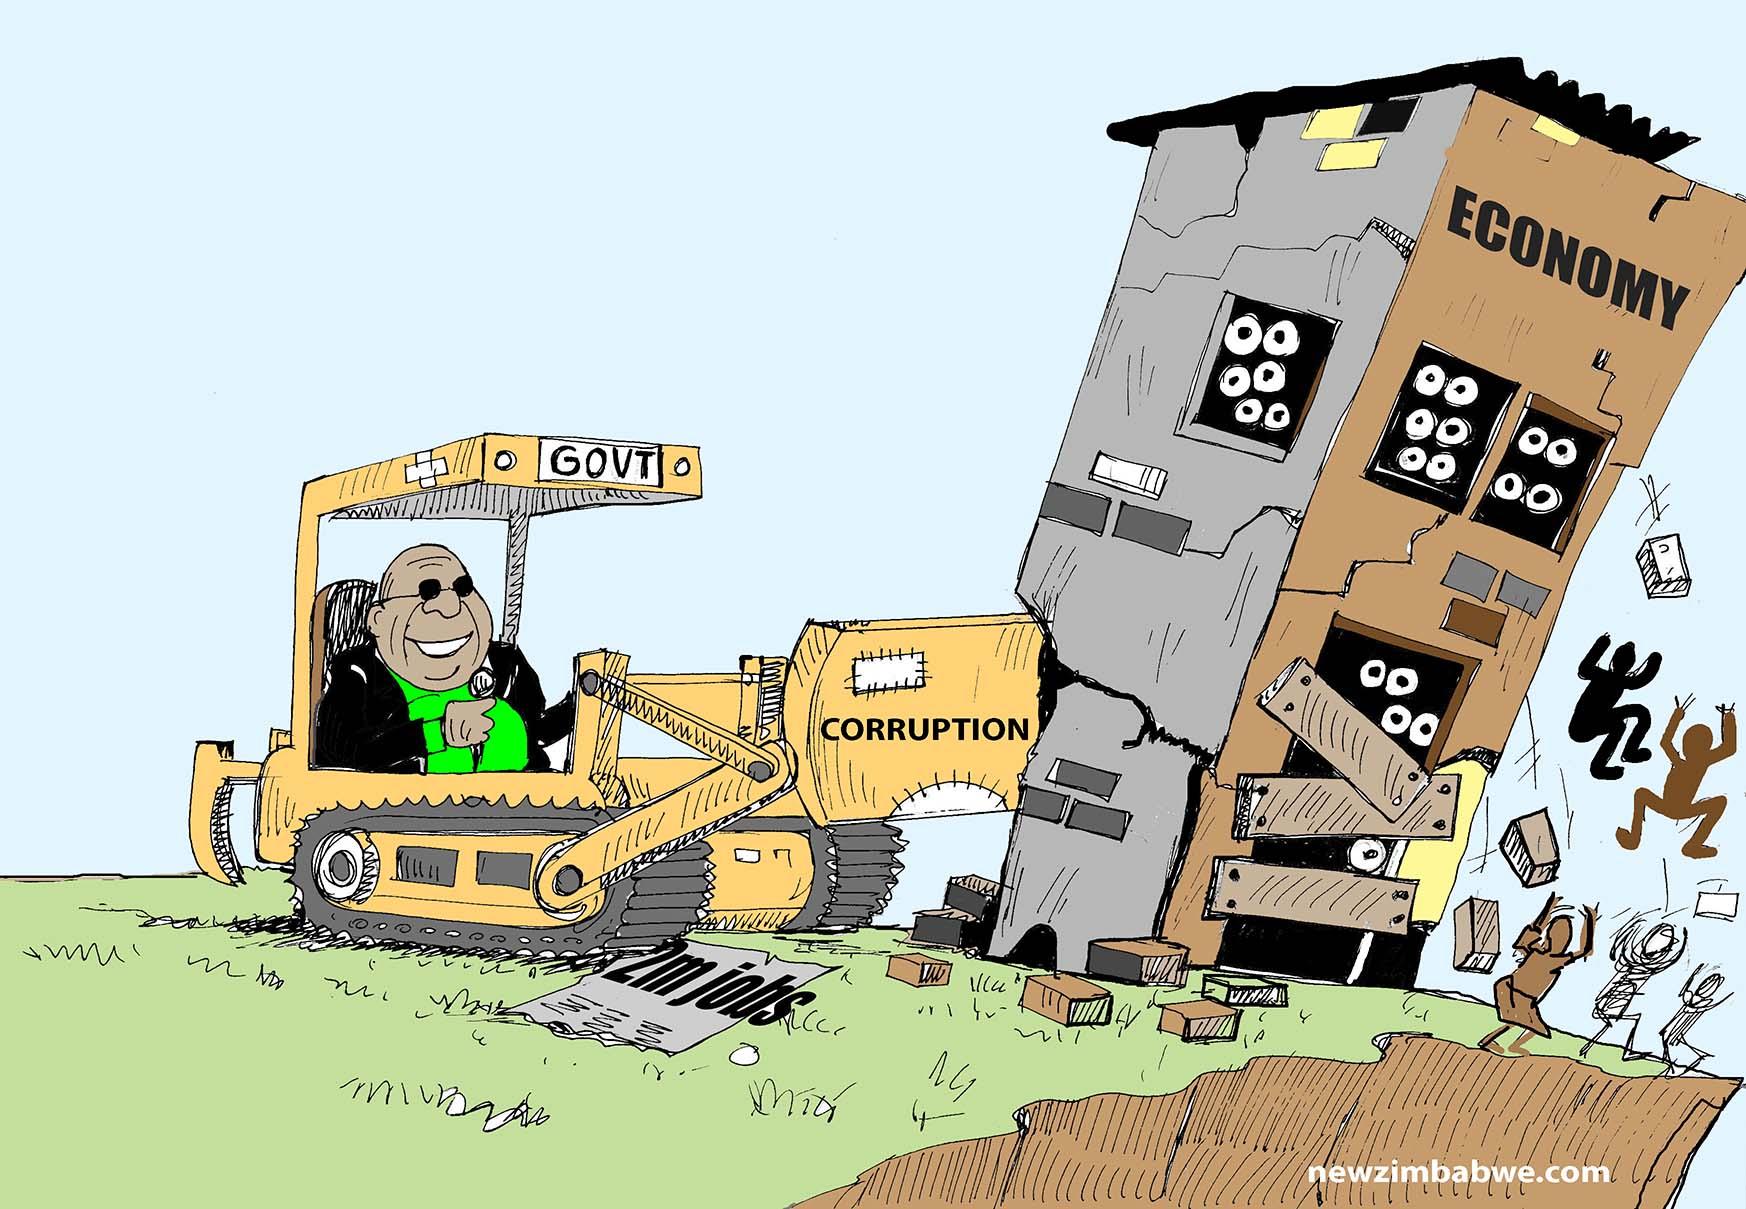 Govt, corruption and the economy